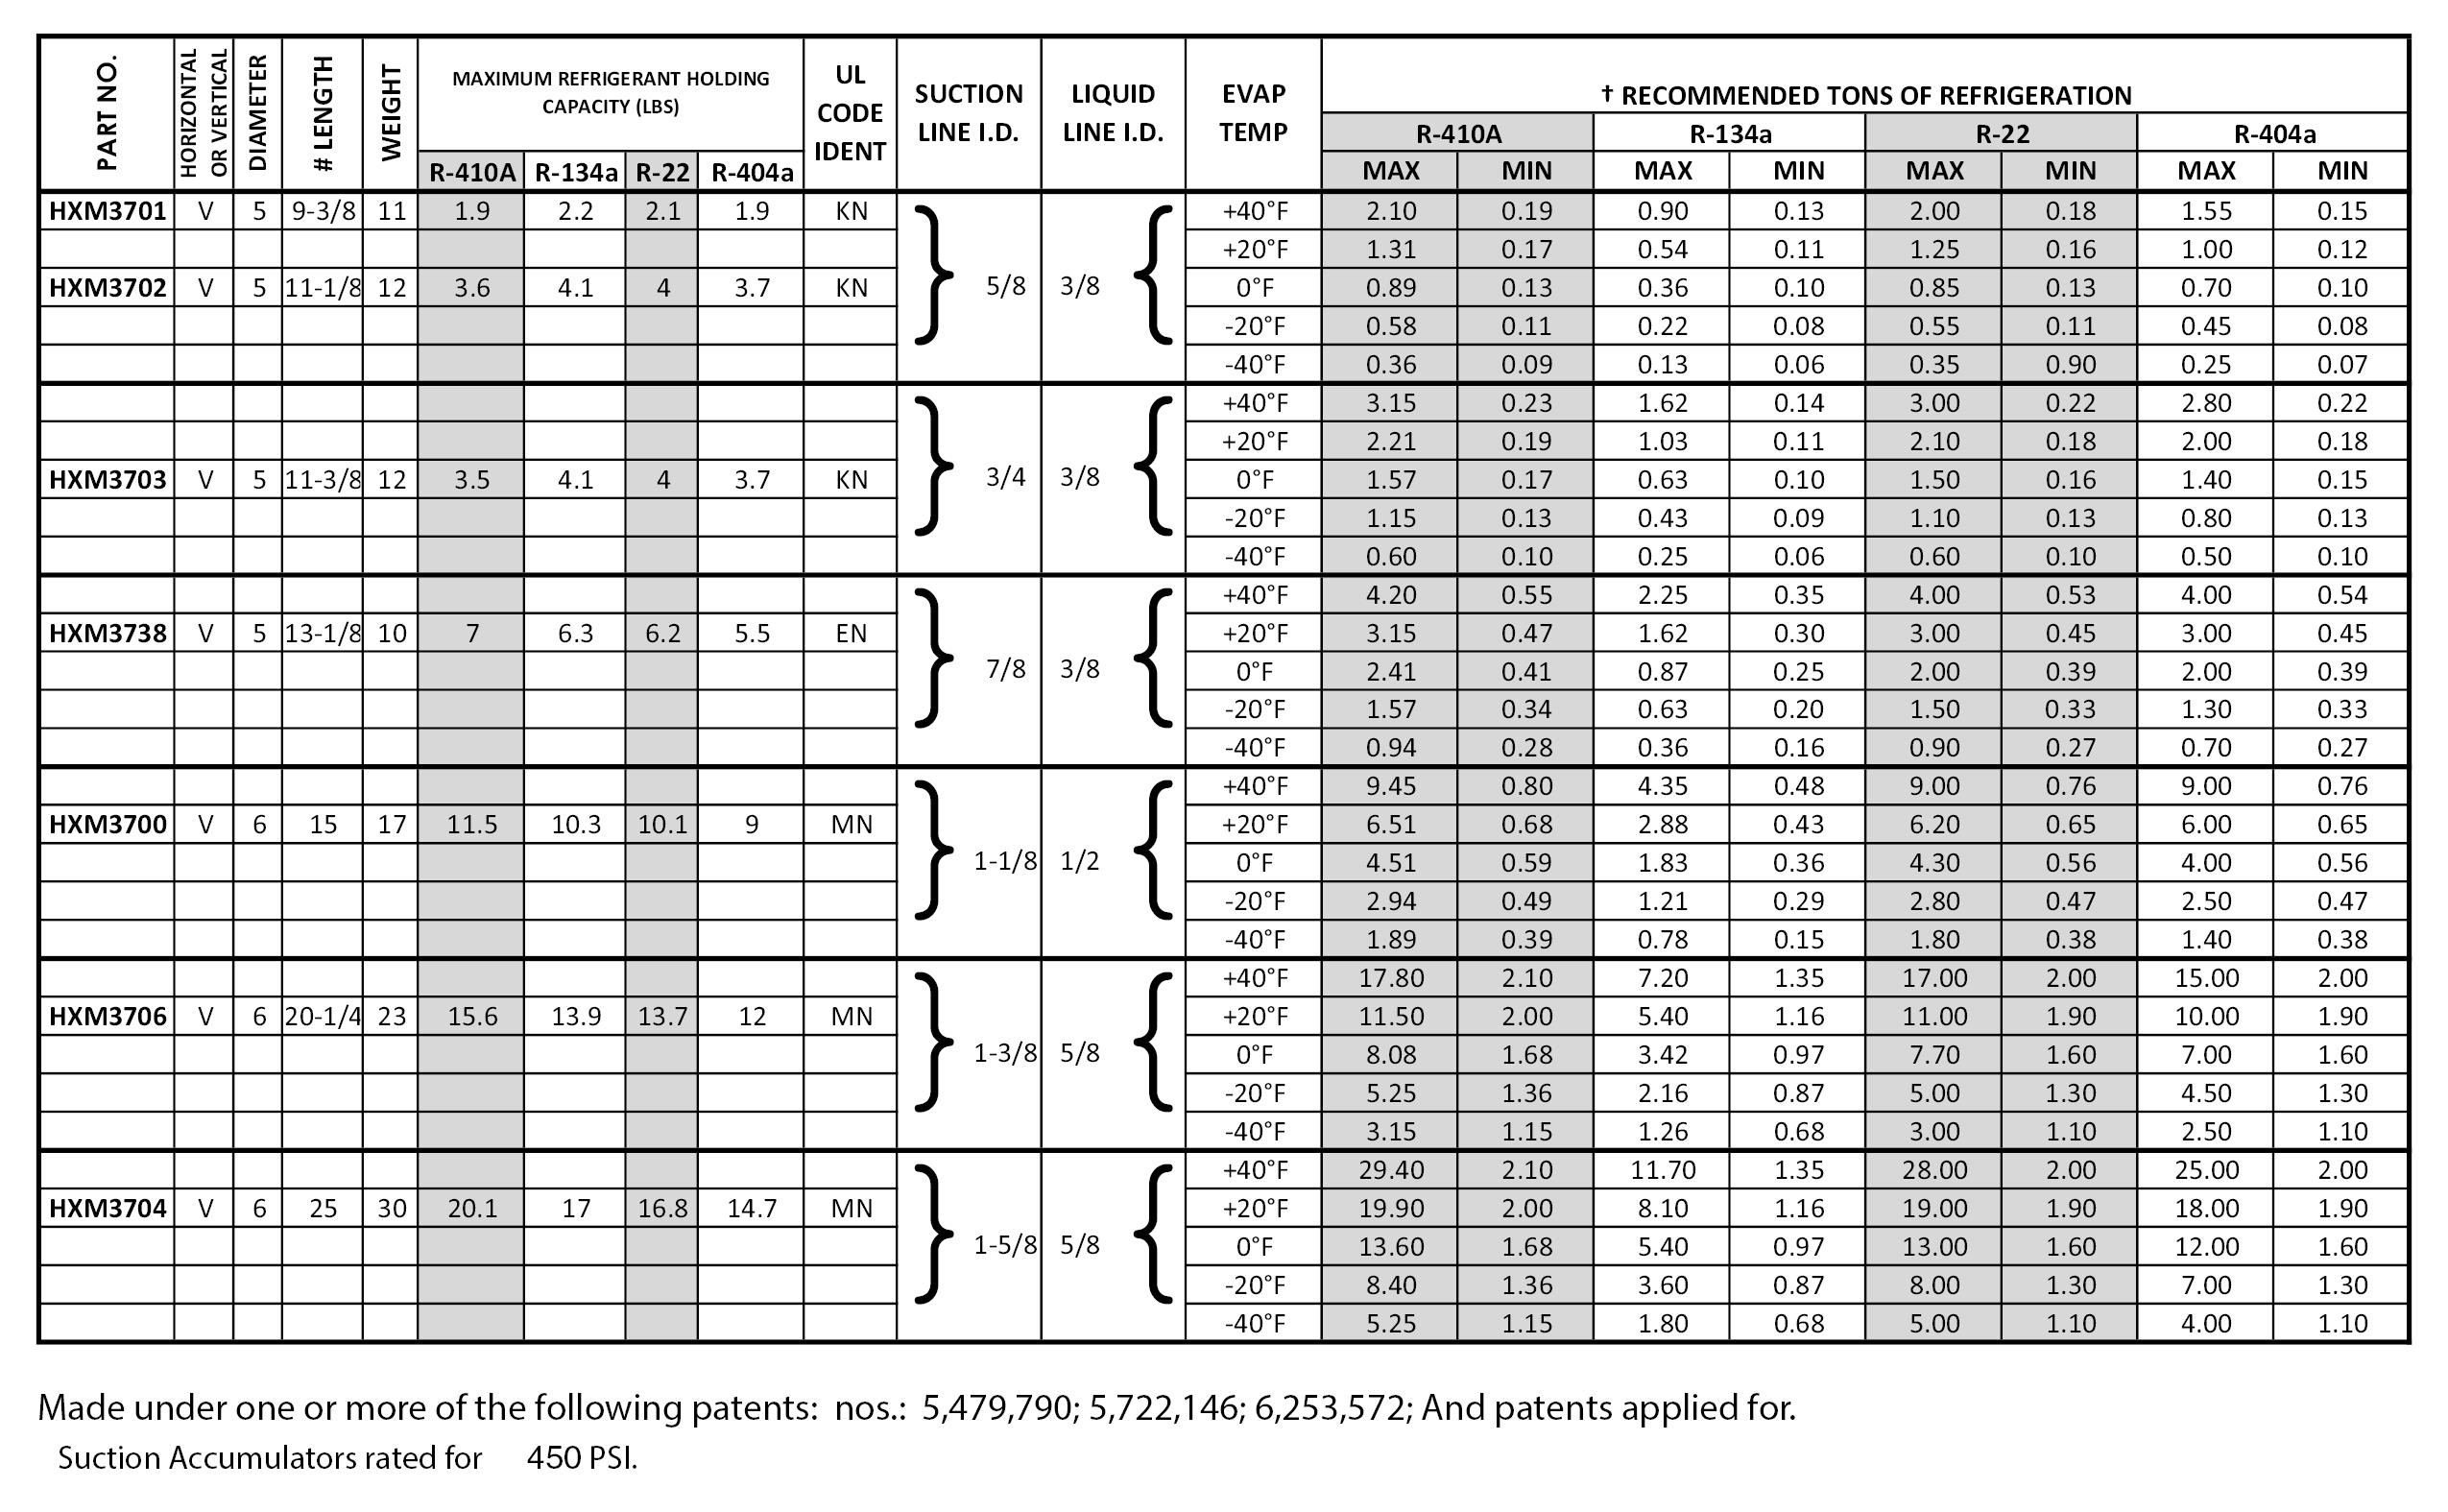 Suction Accumulators - No Sweat No Frost Data